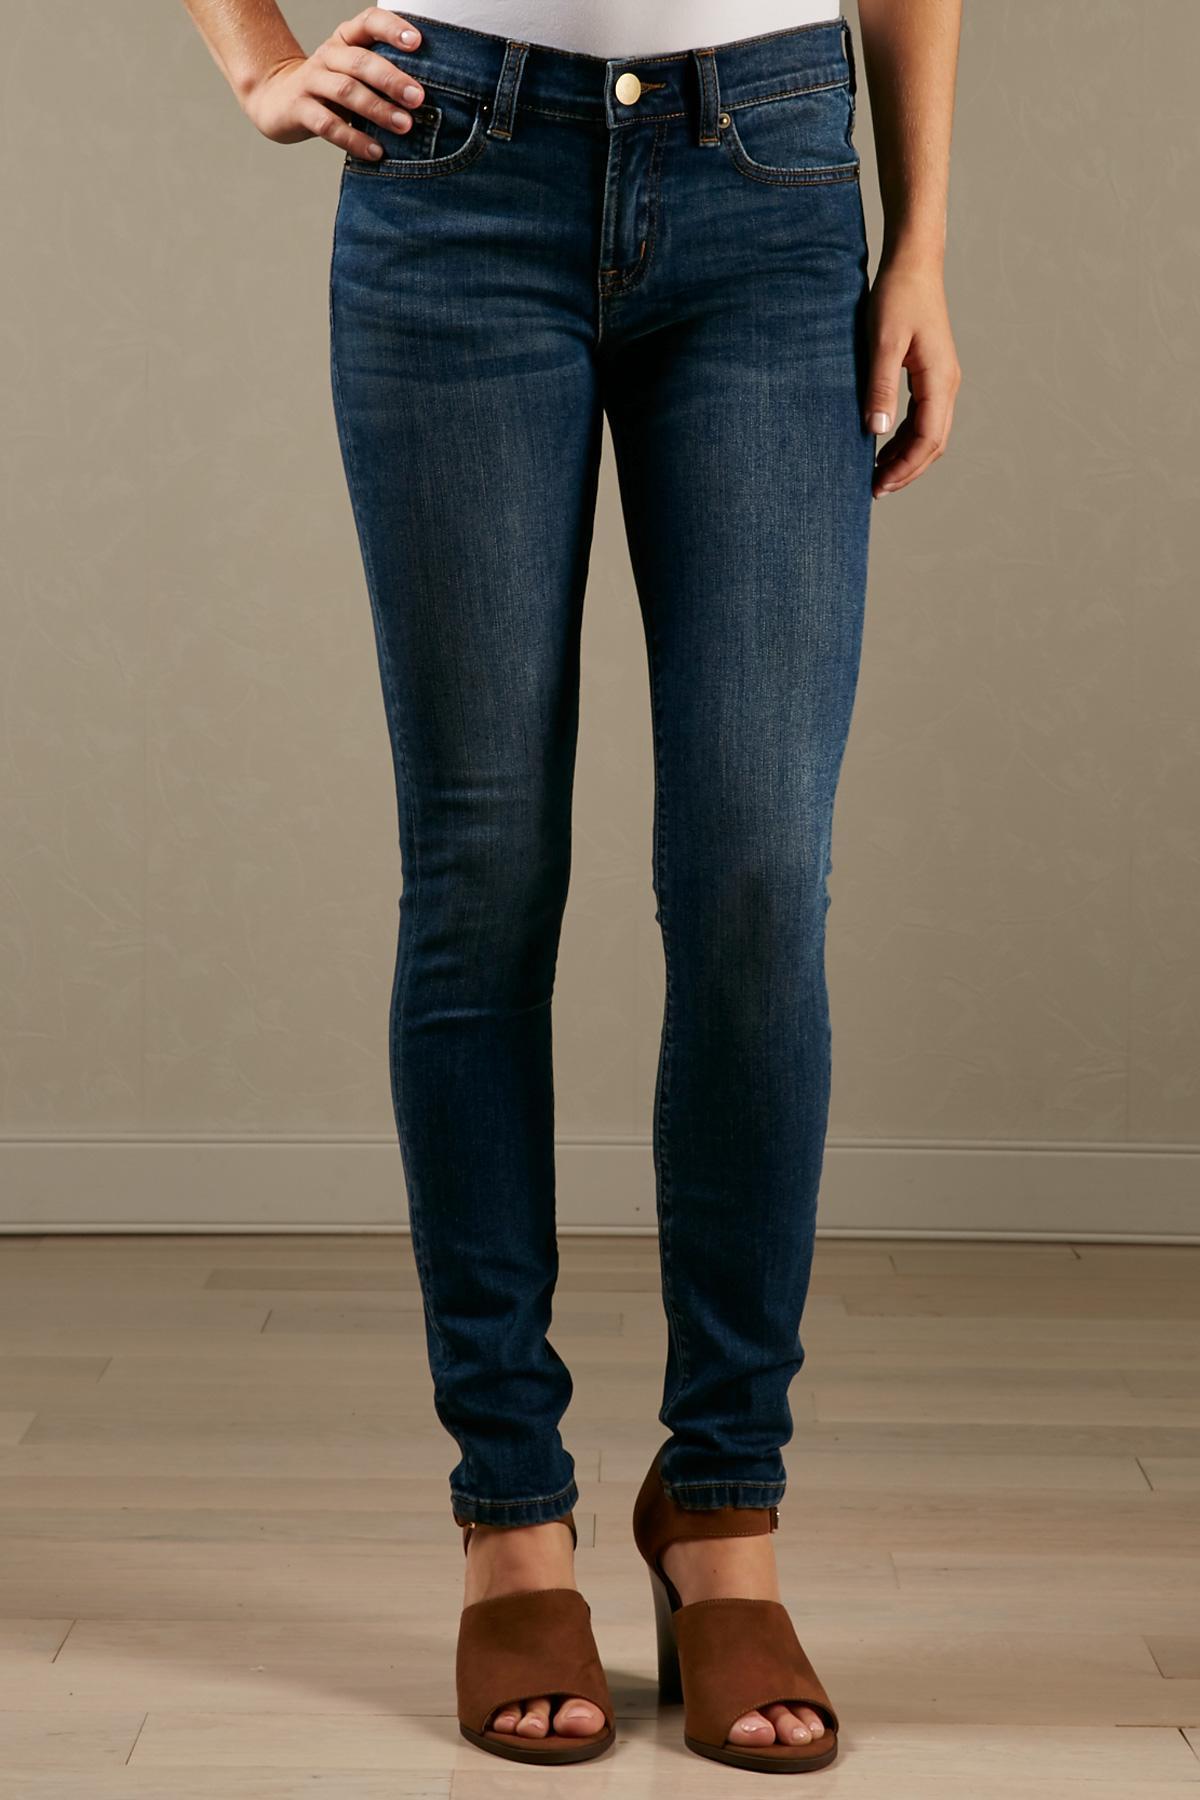 Essential Skinny Jeans